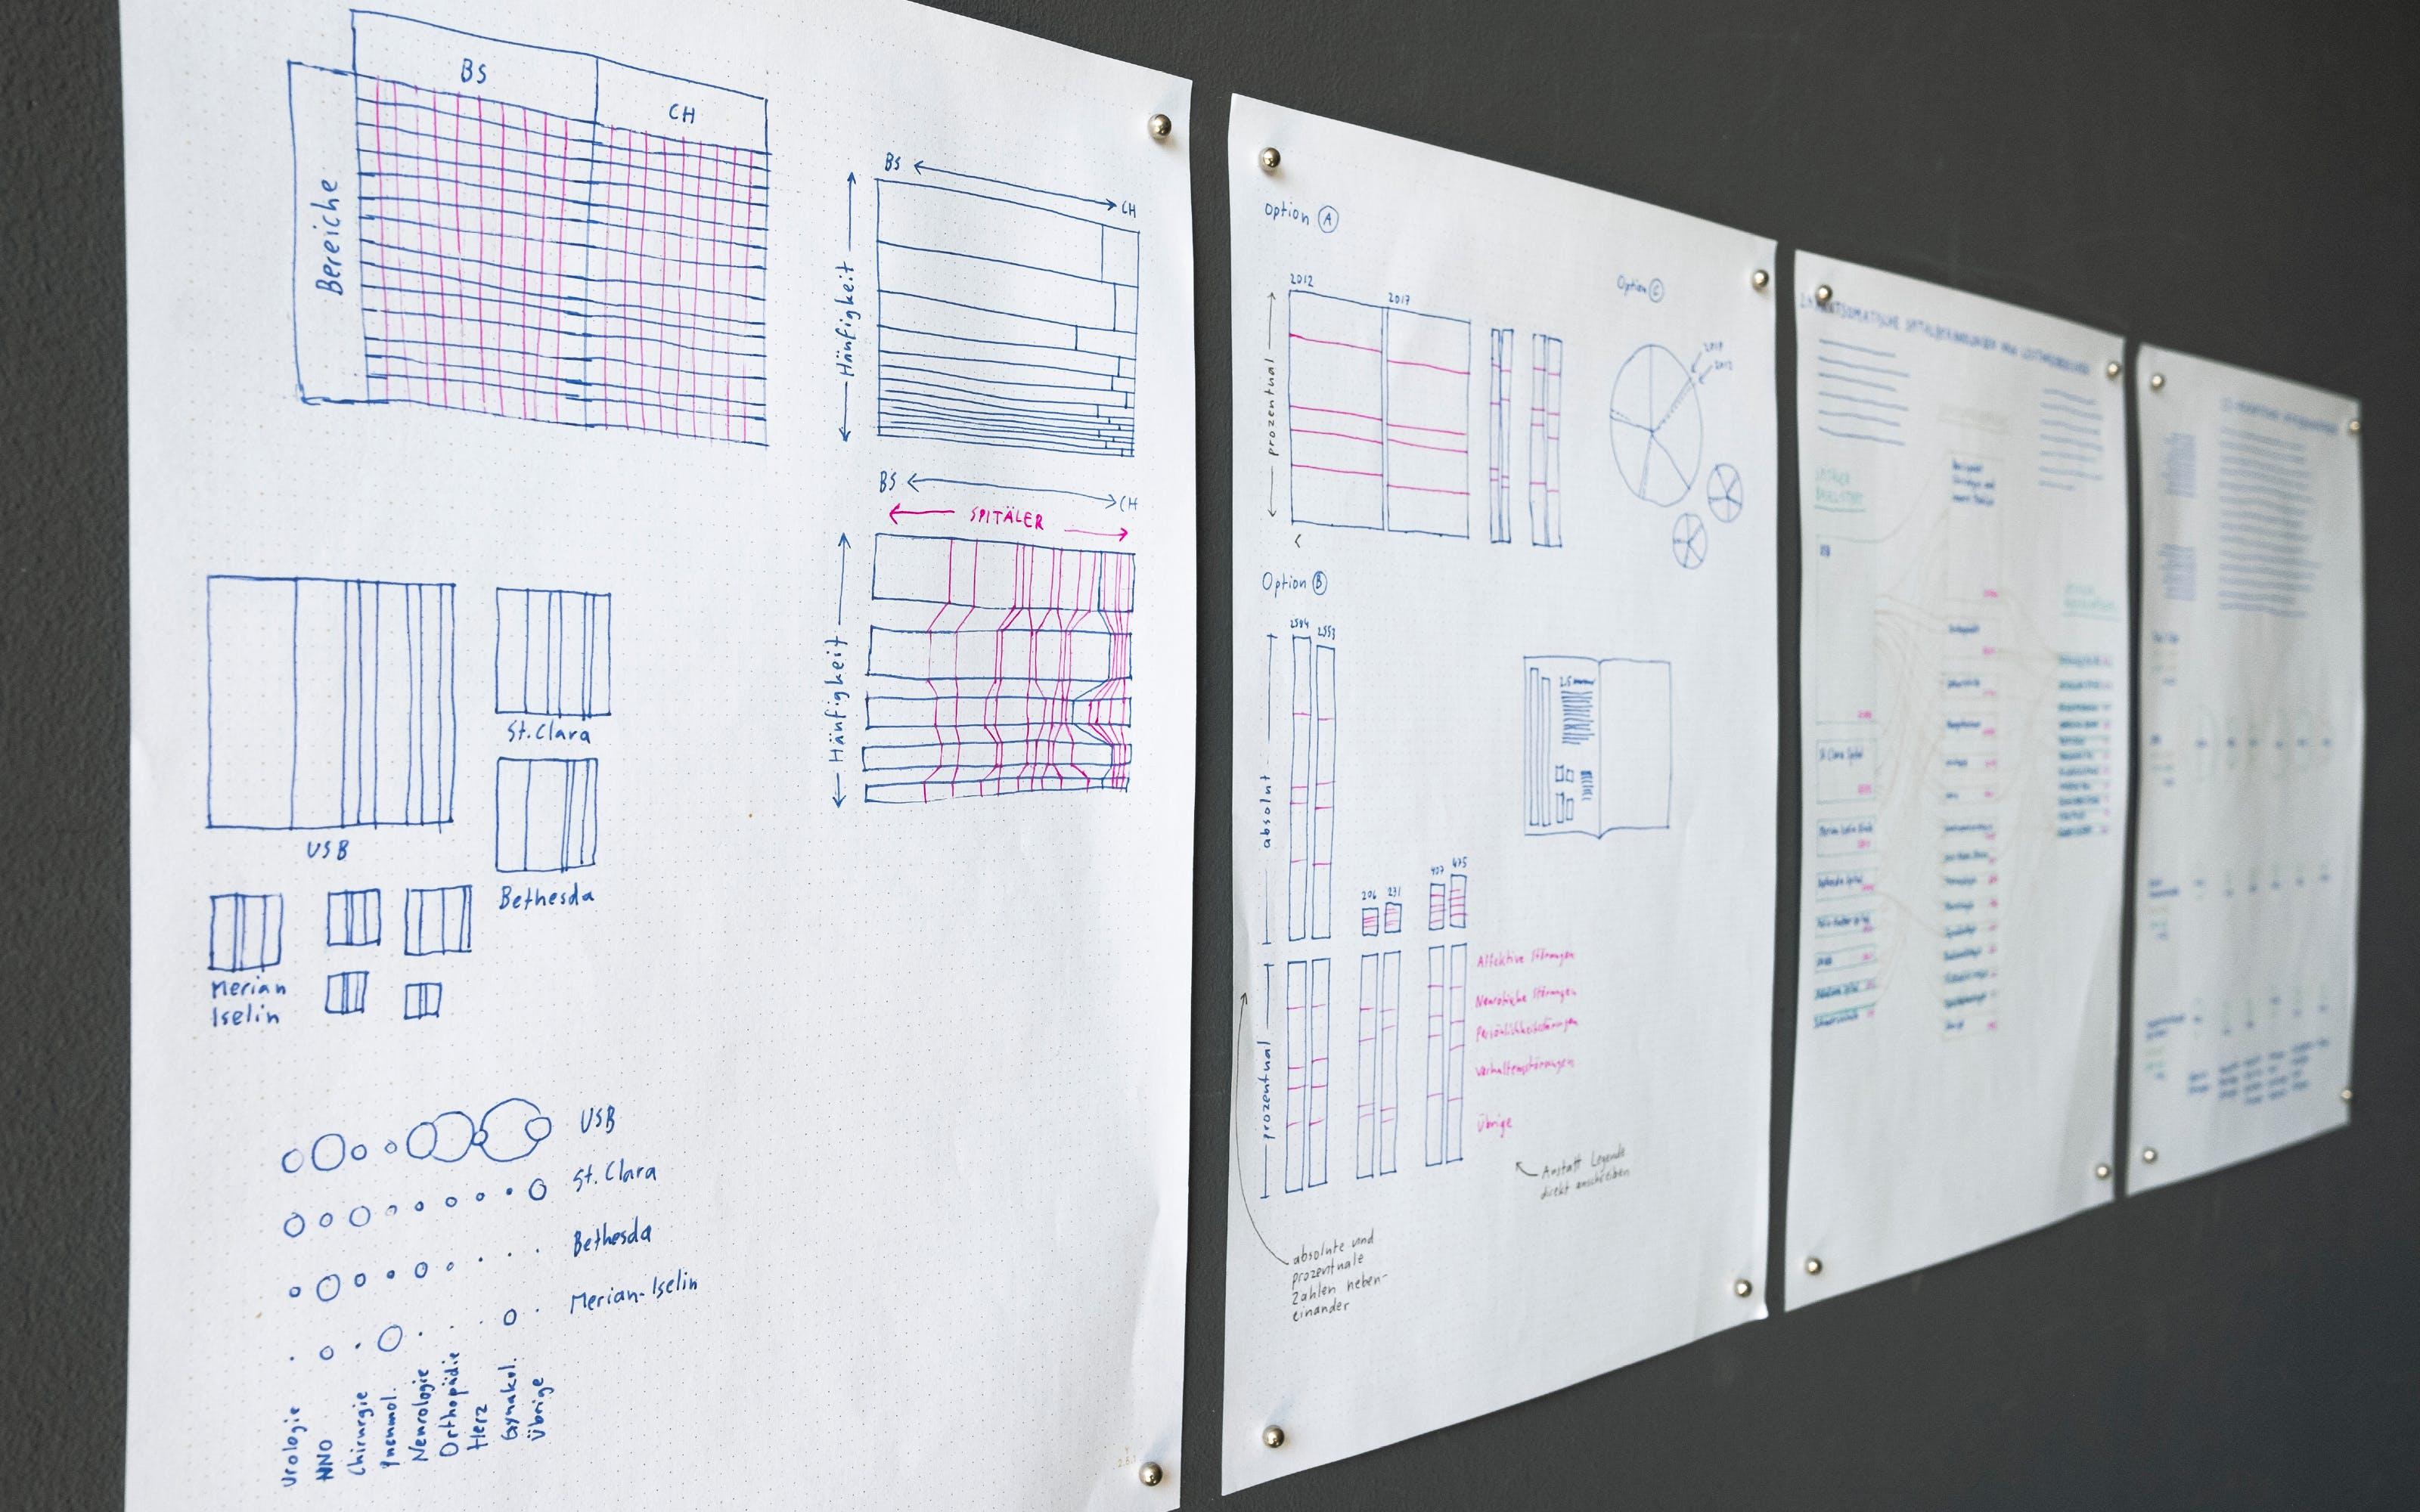 superdot studio healthcare annual report data viz visualization sketches